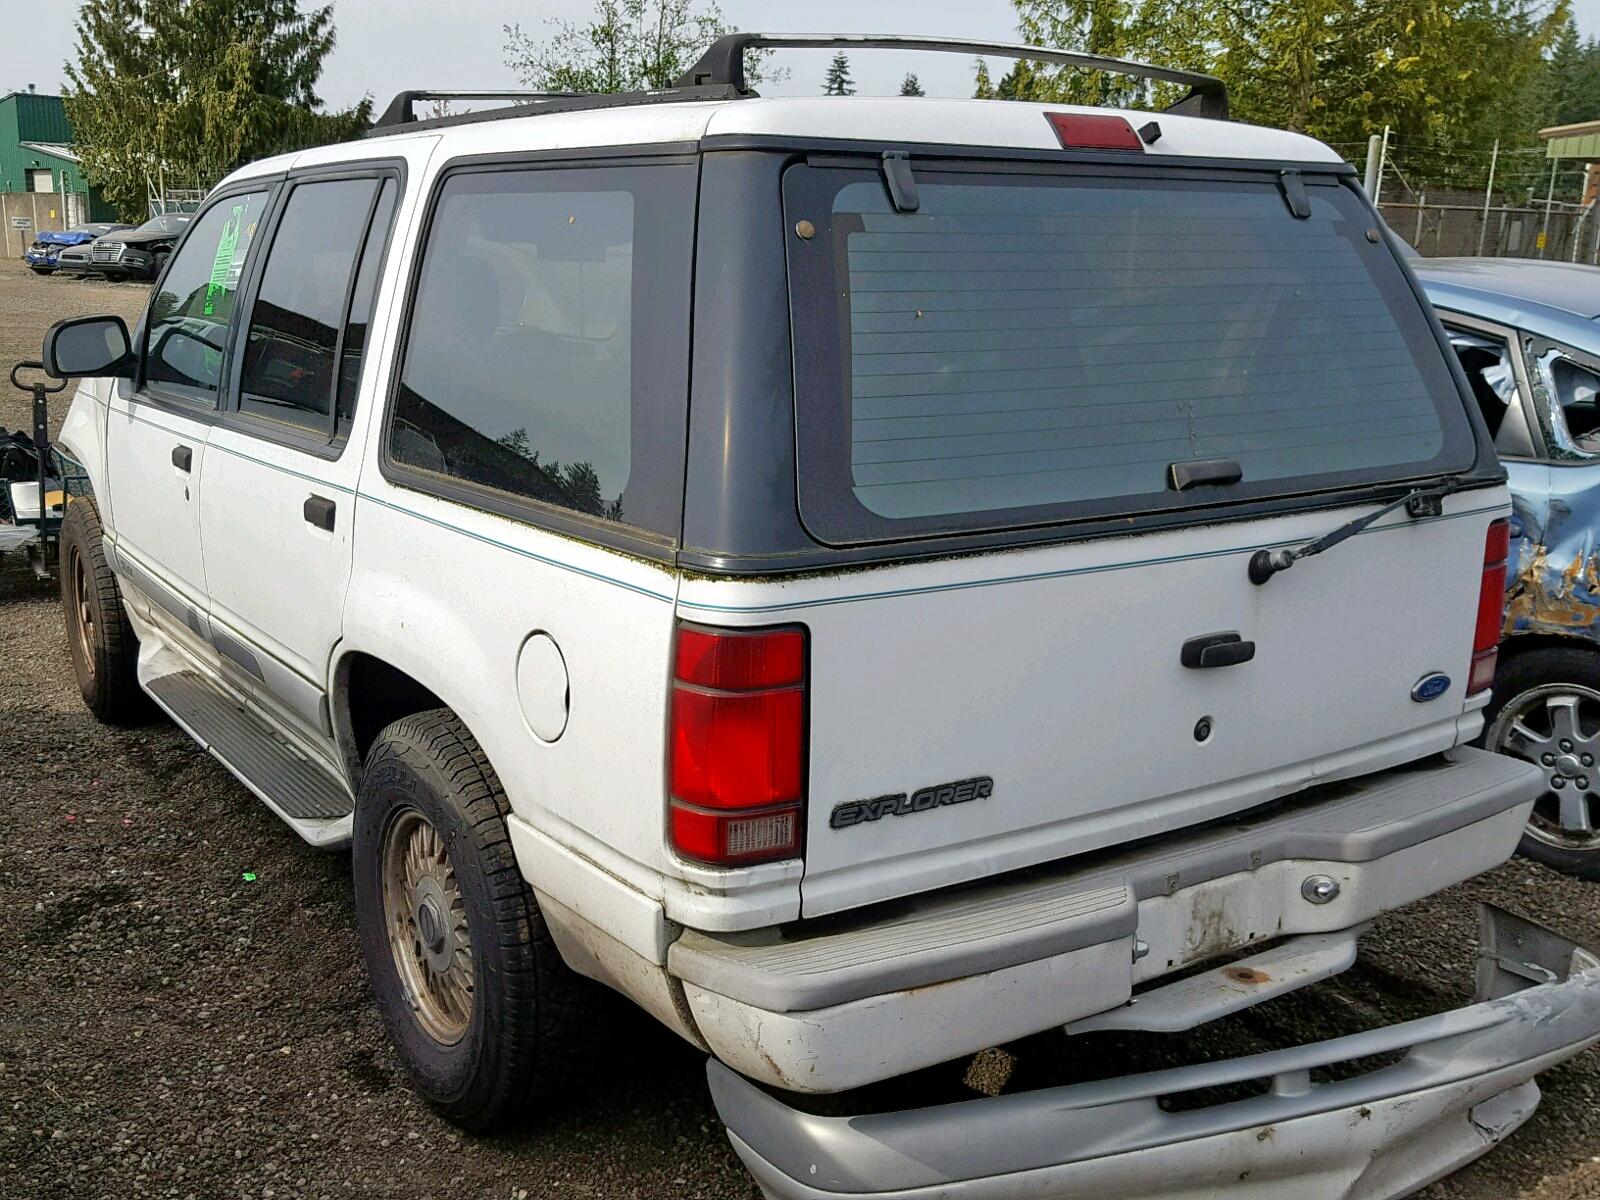 hight resolution of  1fmdu34x7rua08550 1994 ford explorer 4 0l angle view 1fmdu34x7rua08550